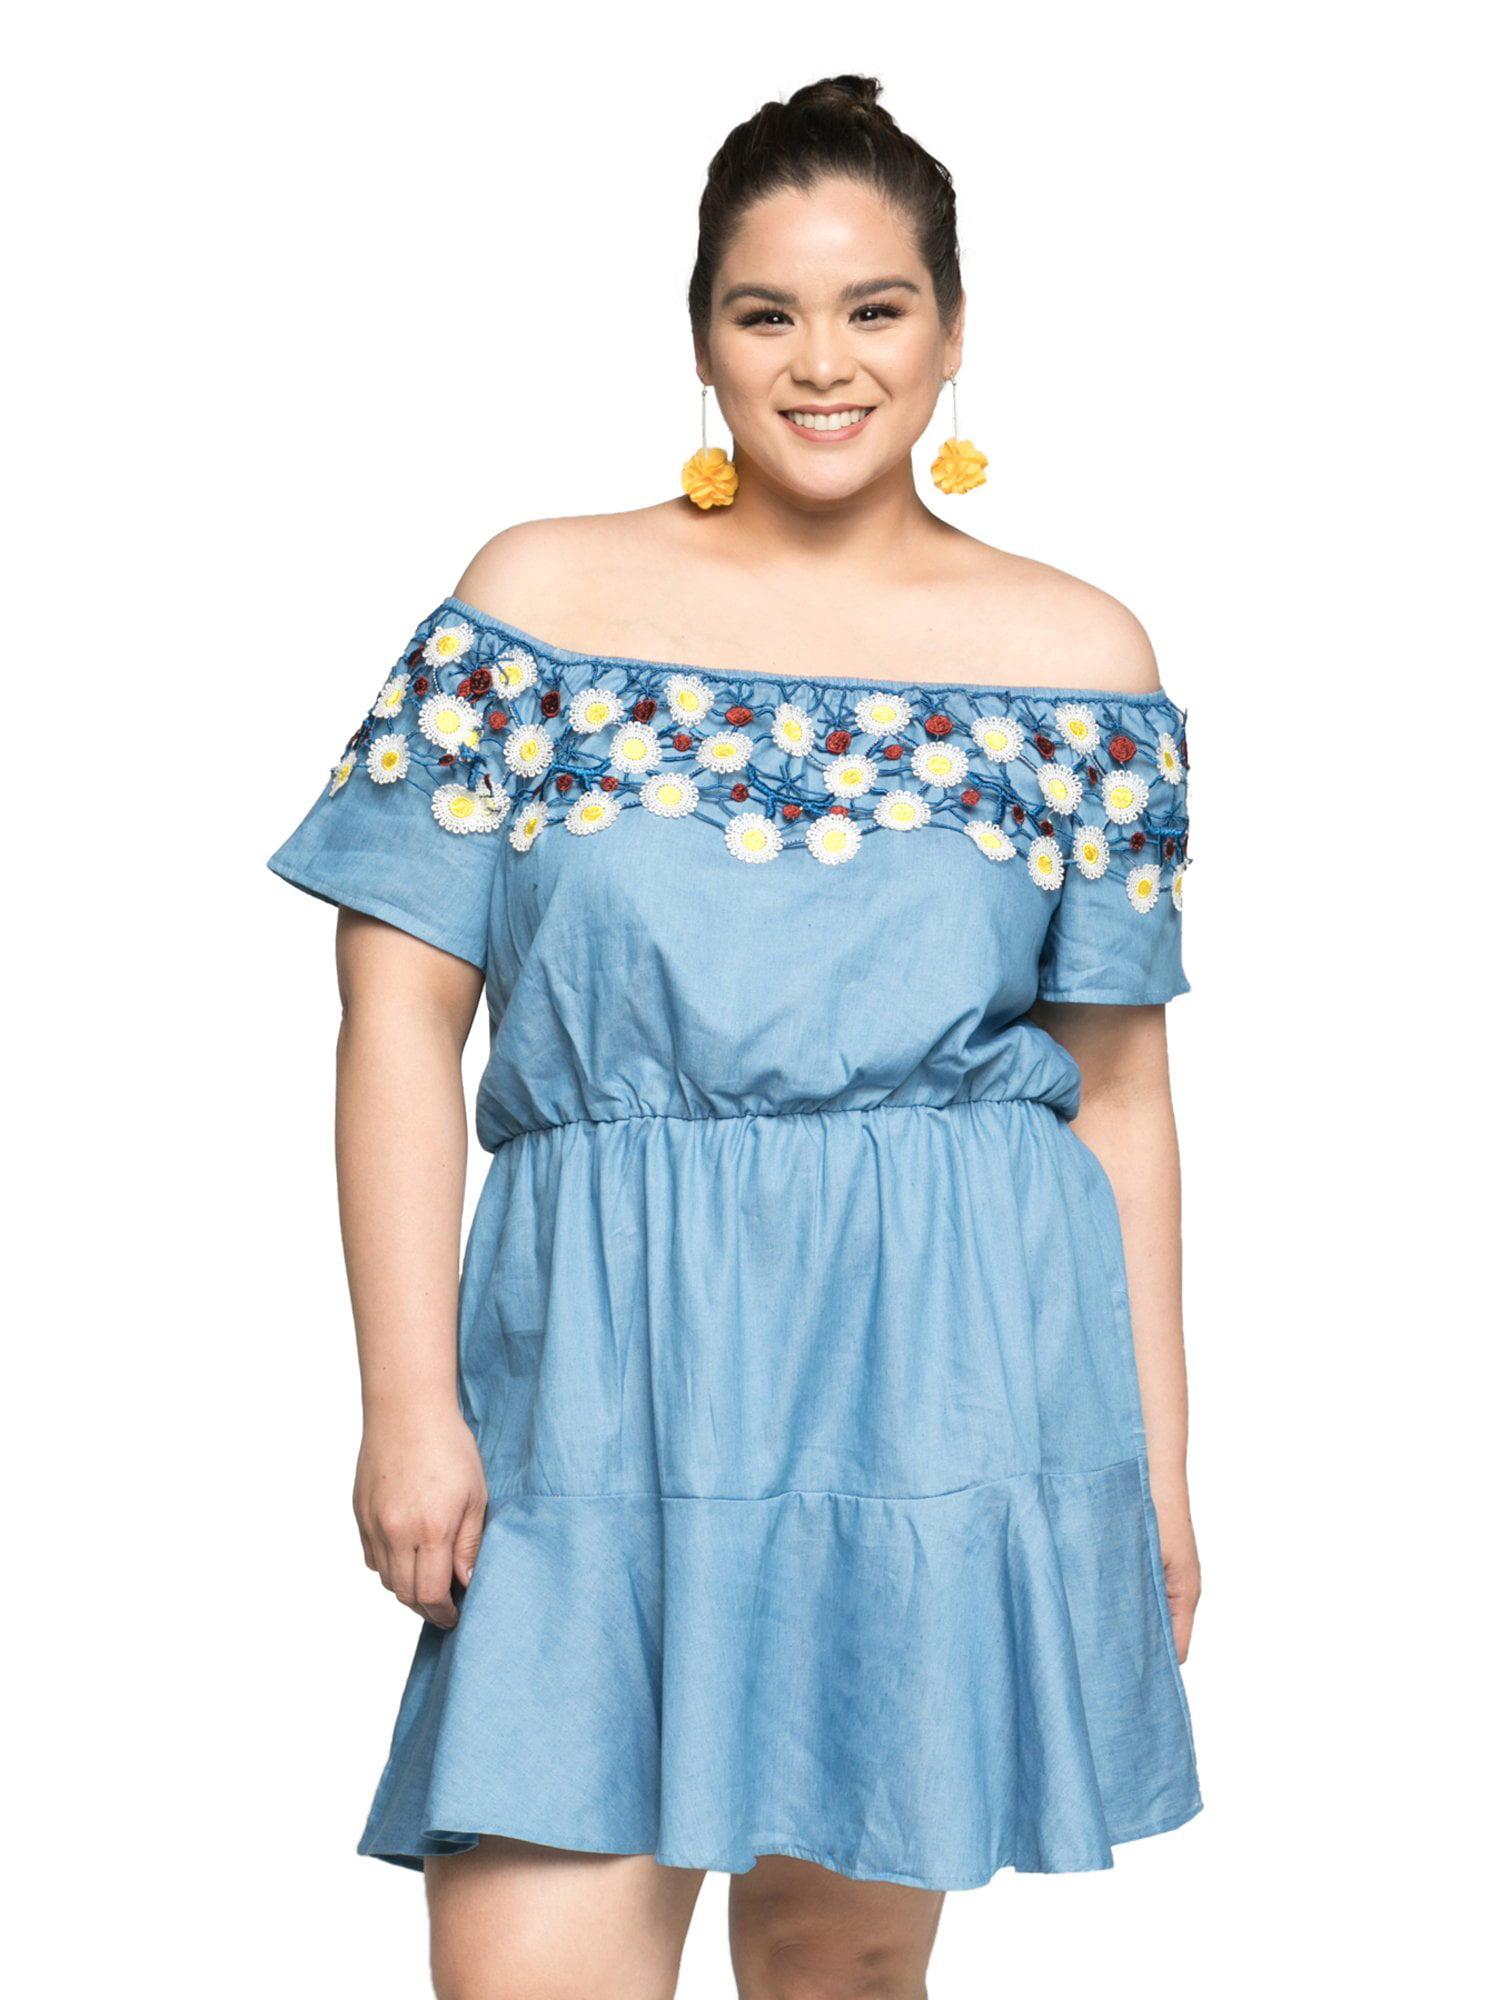 333131fc2d6 Xehar - Xehar Women s Plus Size Casual Off Shoulder Elastic Waist Short Summer  Dress - Walmart.com